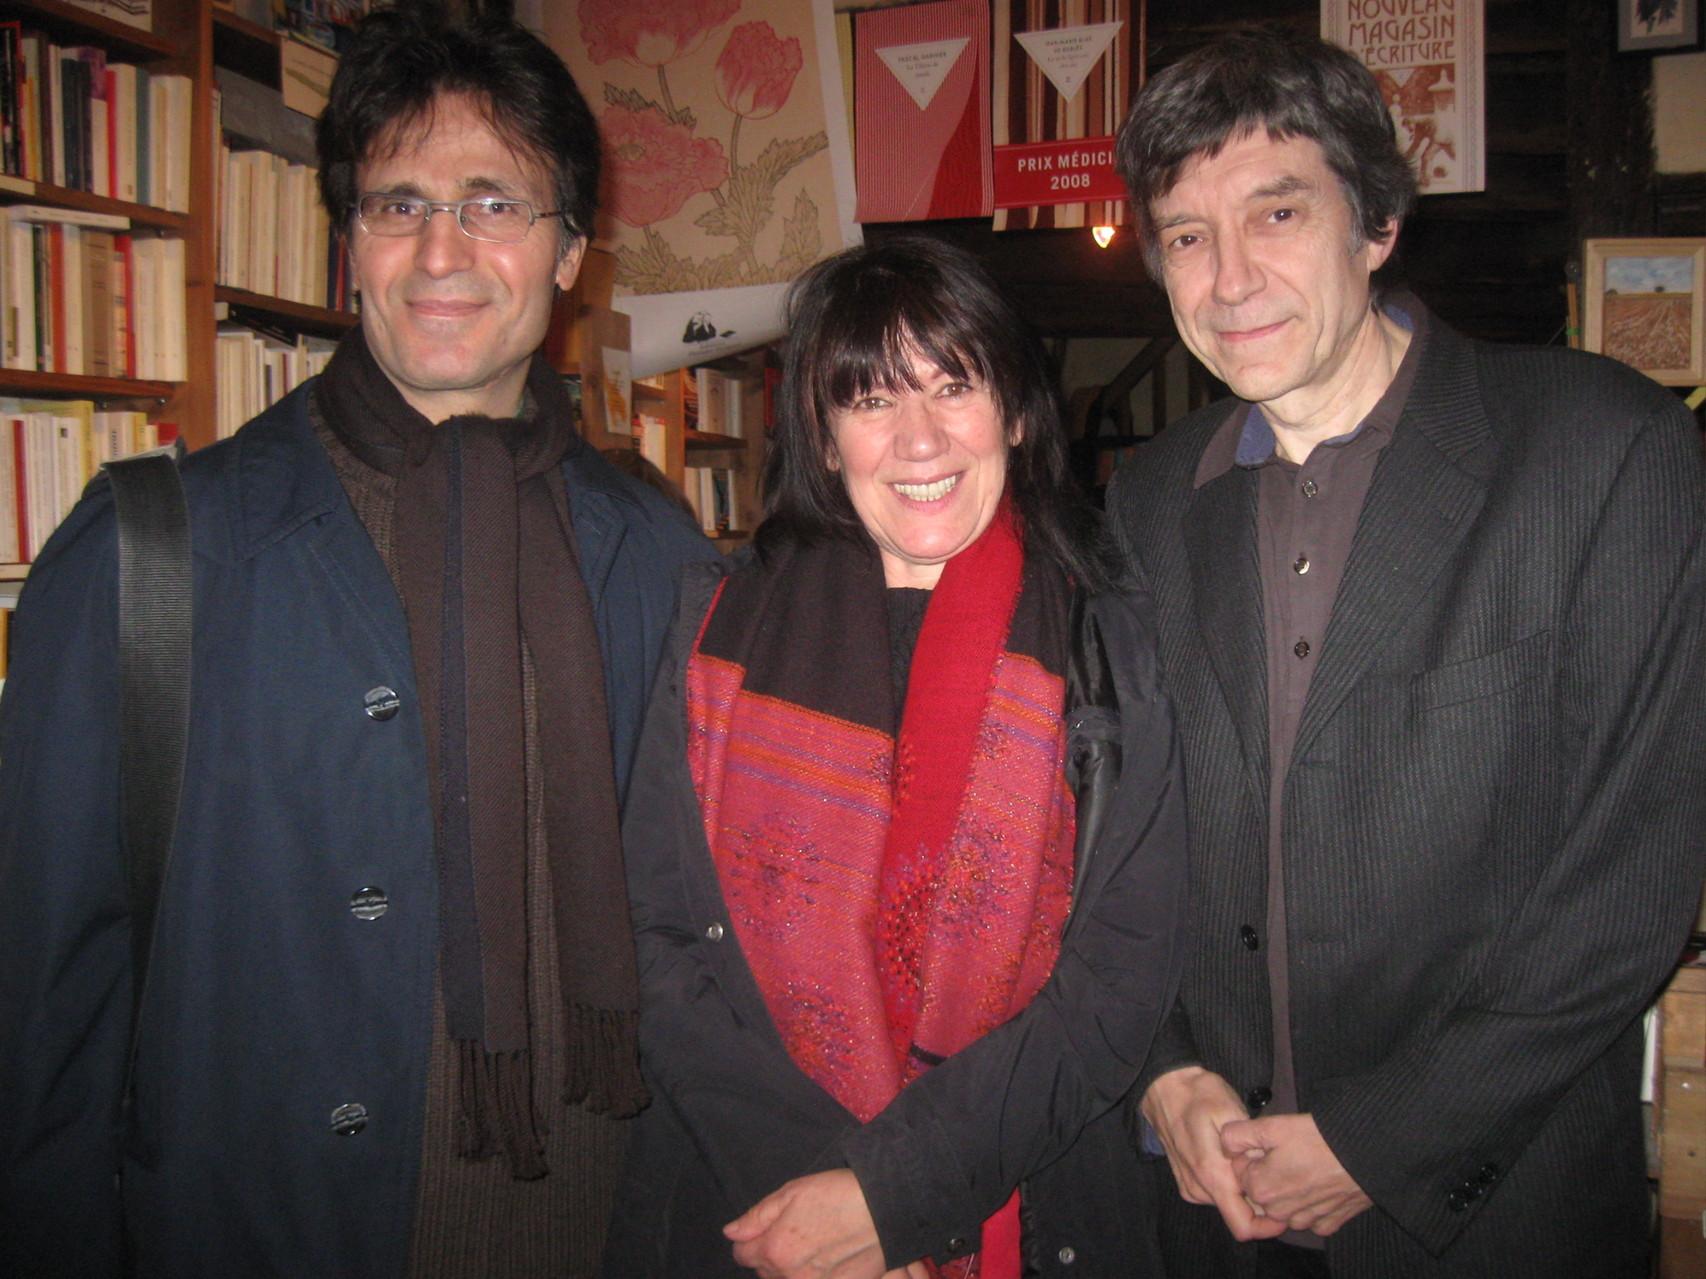 Avec Seyhmus Dagtekin et Alain Monnier, Sarrant 2010